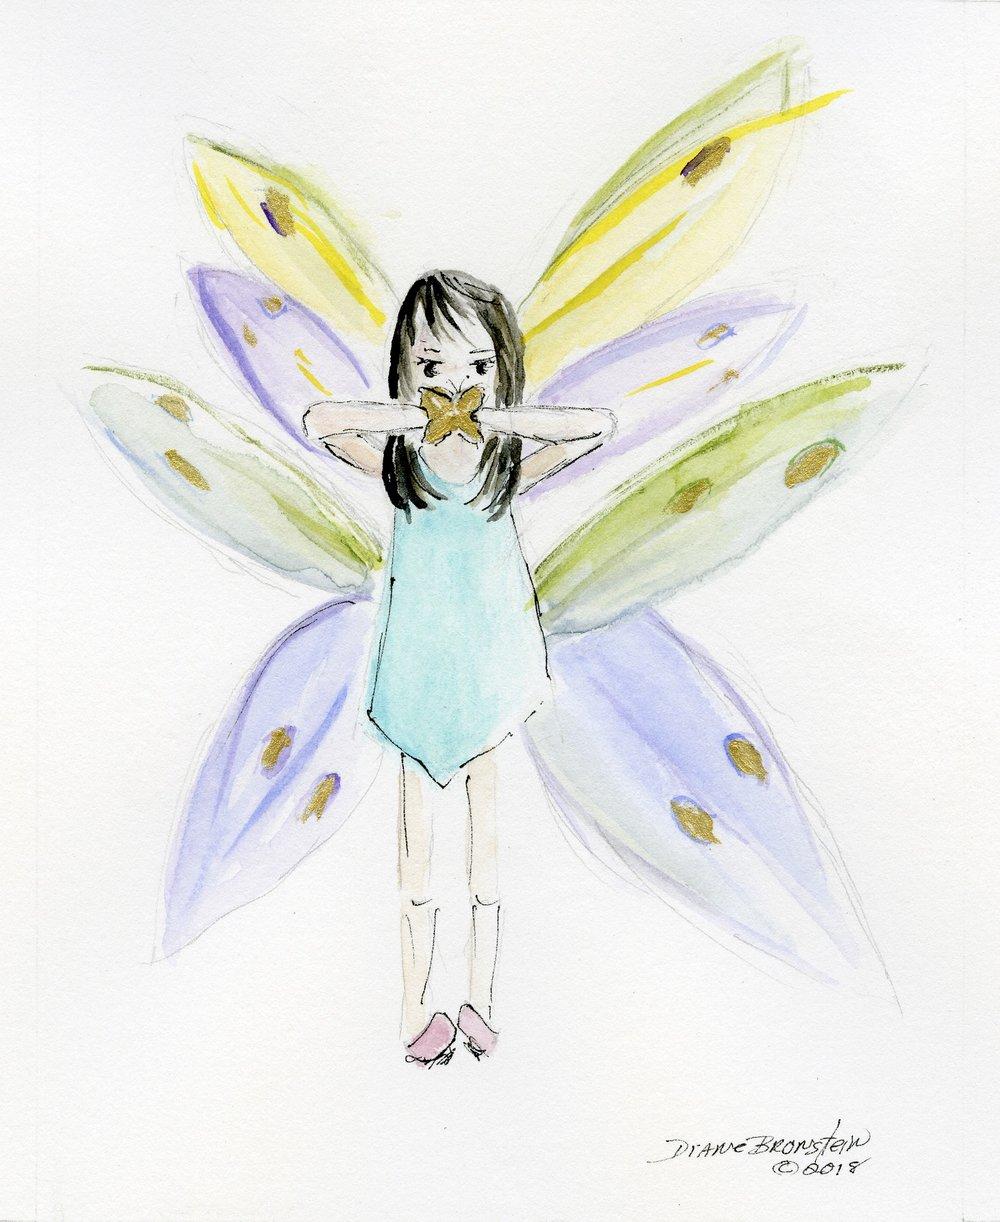 Little Miss Butterfly... actually mischievous.